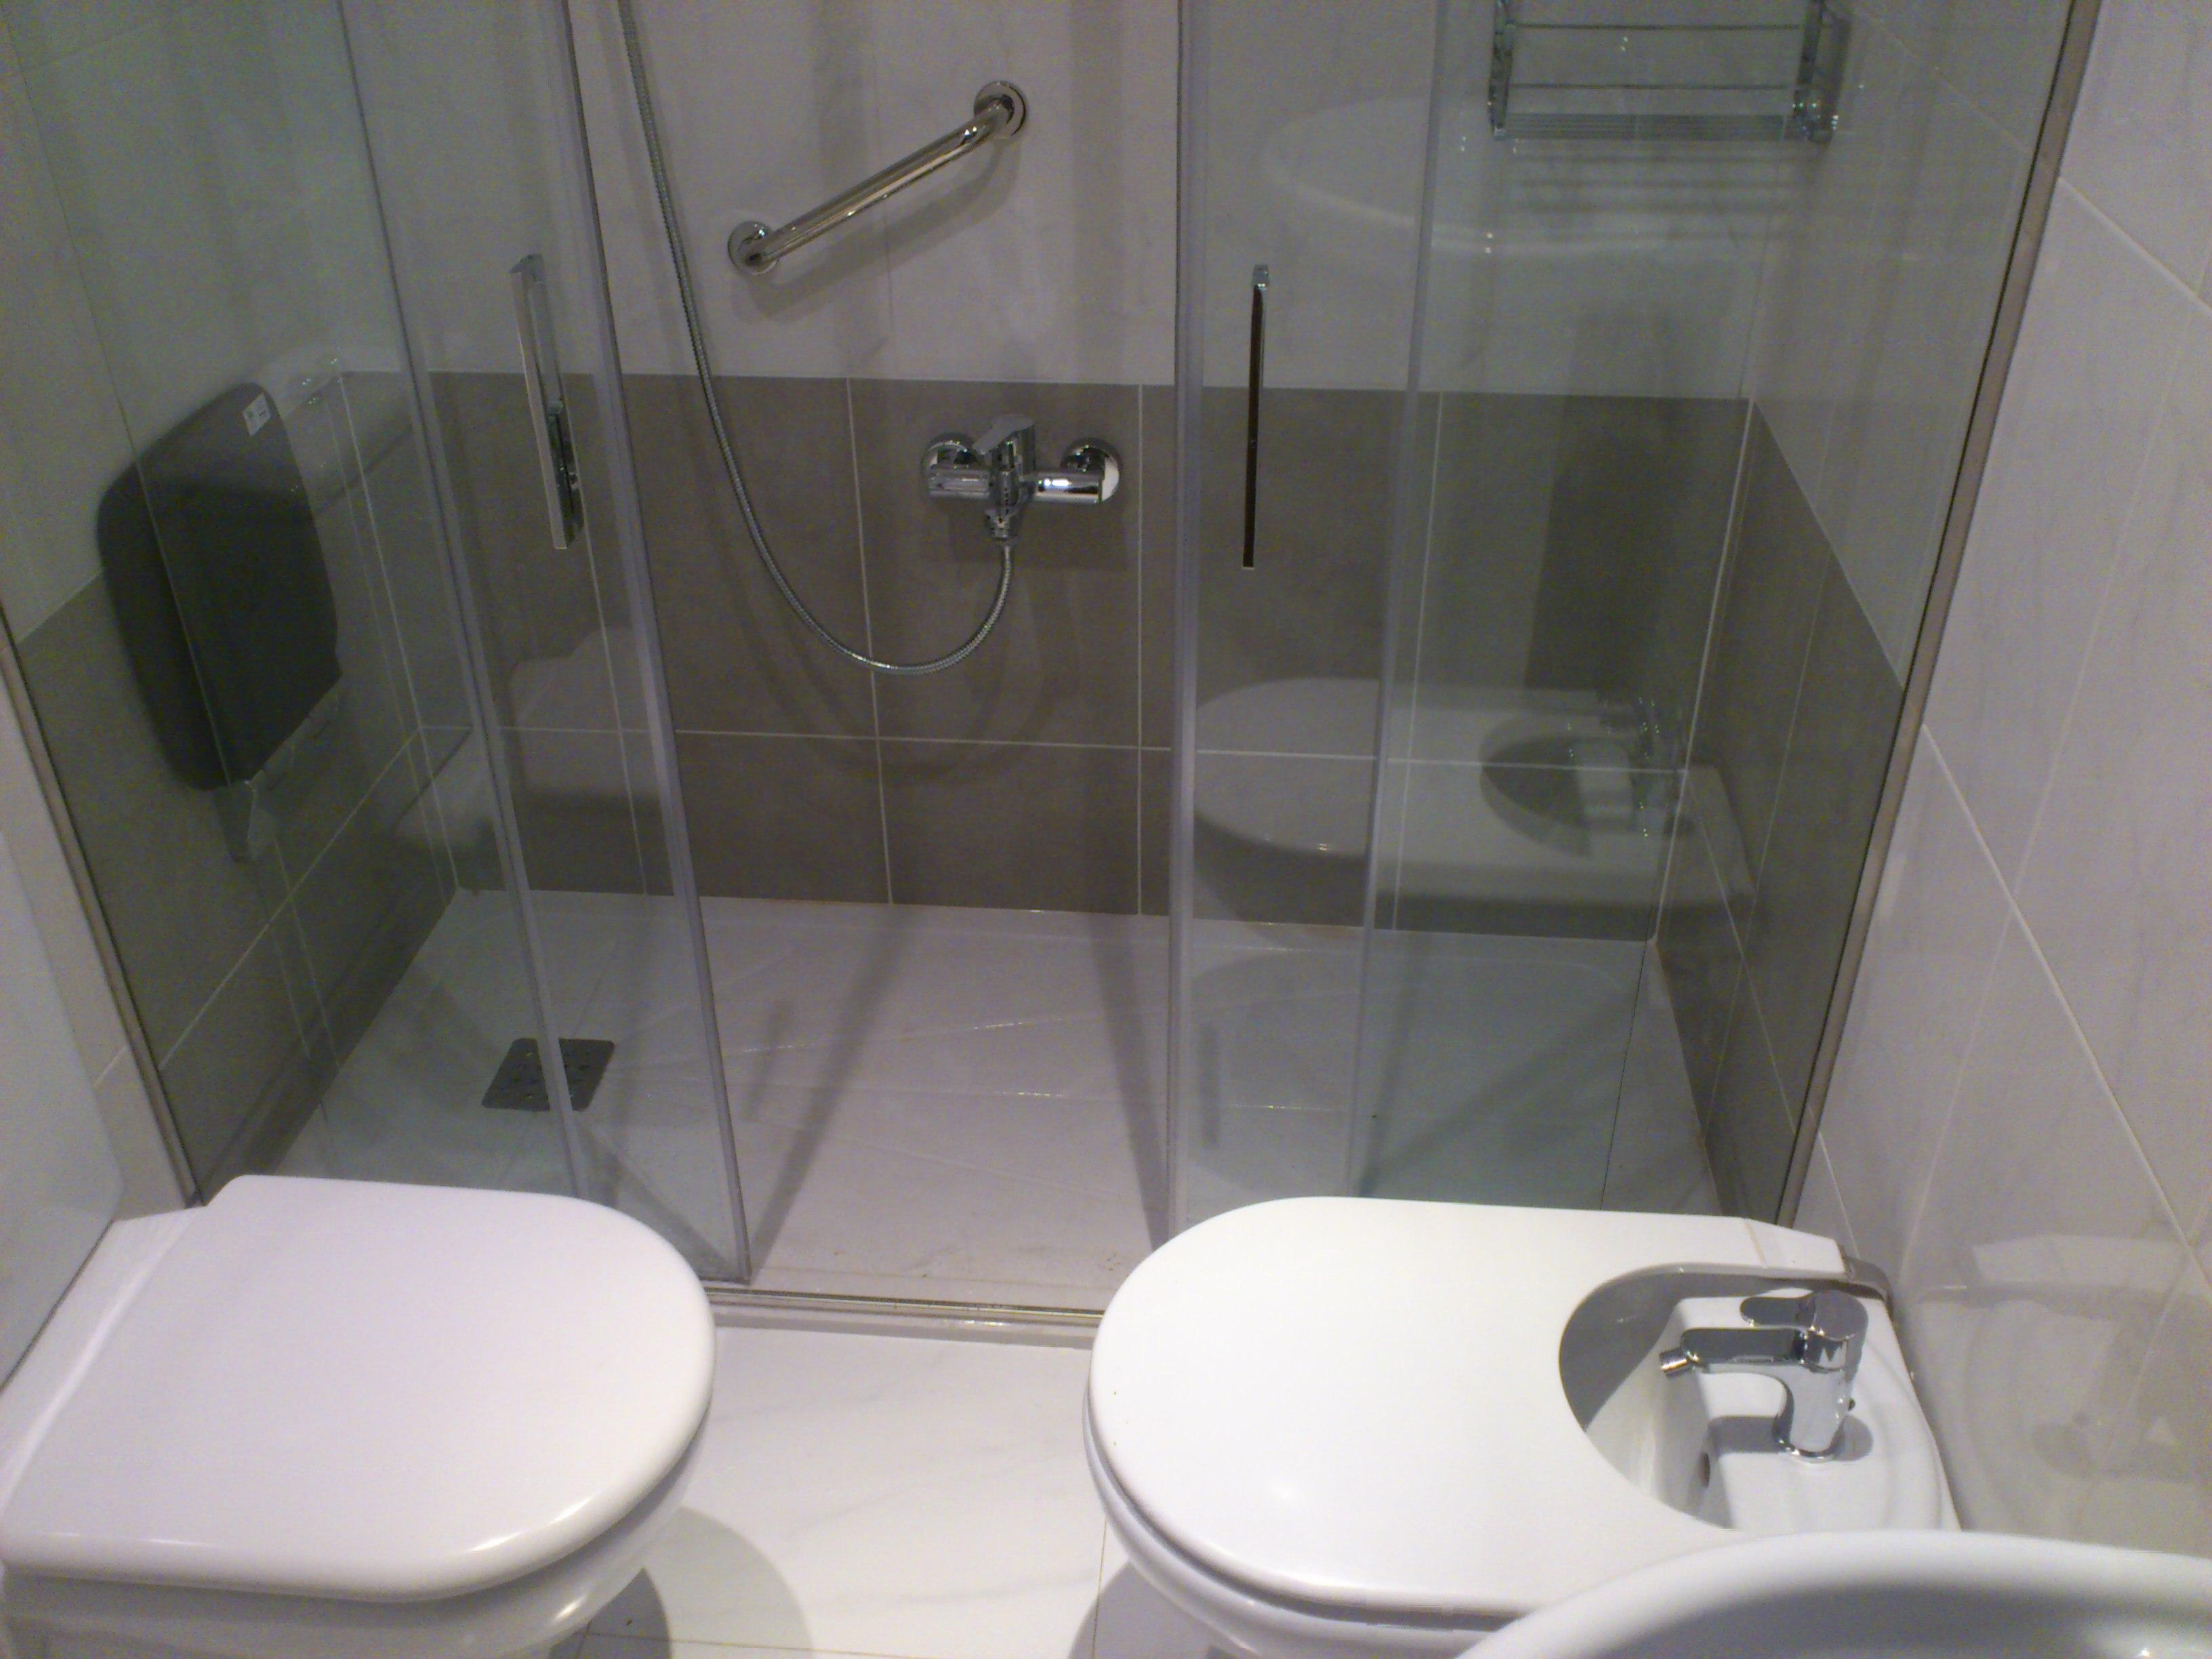 Reforma Baño Banera Por Ducha:Cambio Bañera por Ducha Hondarribia